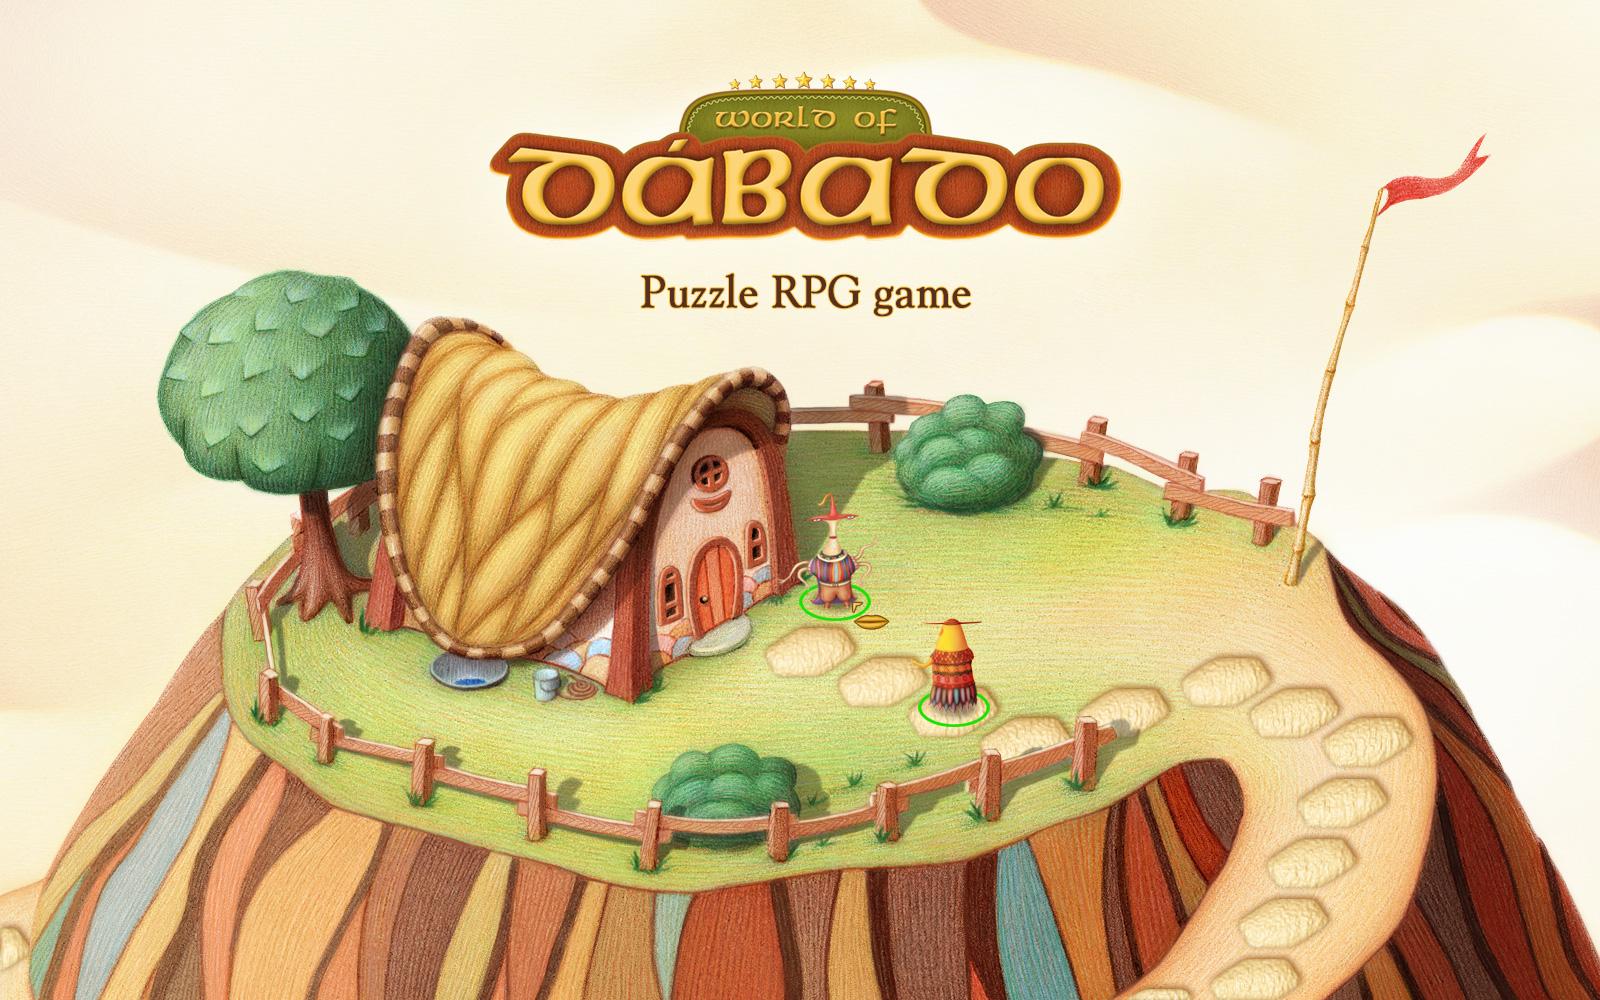 World of Dabado - Puzzle RPG game